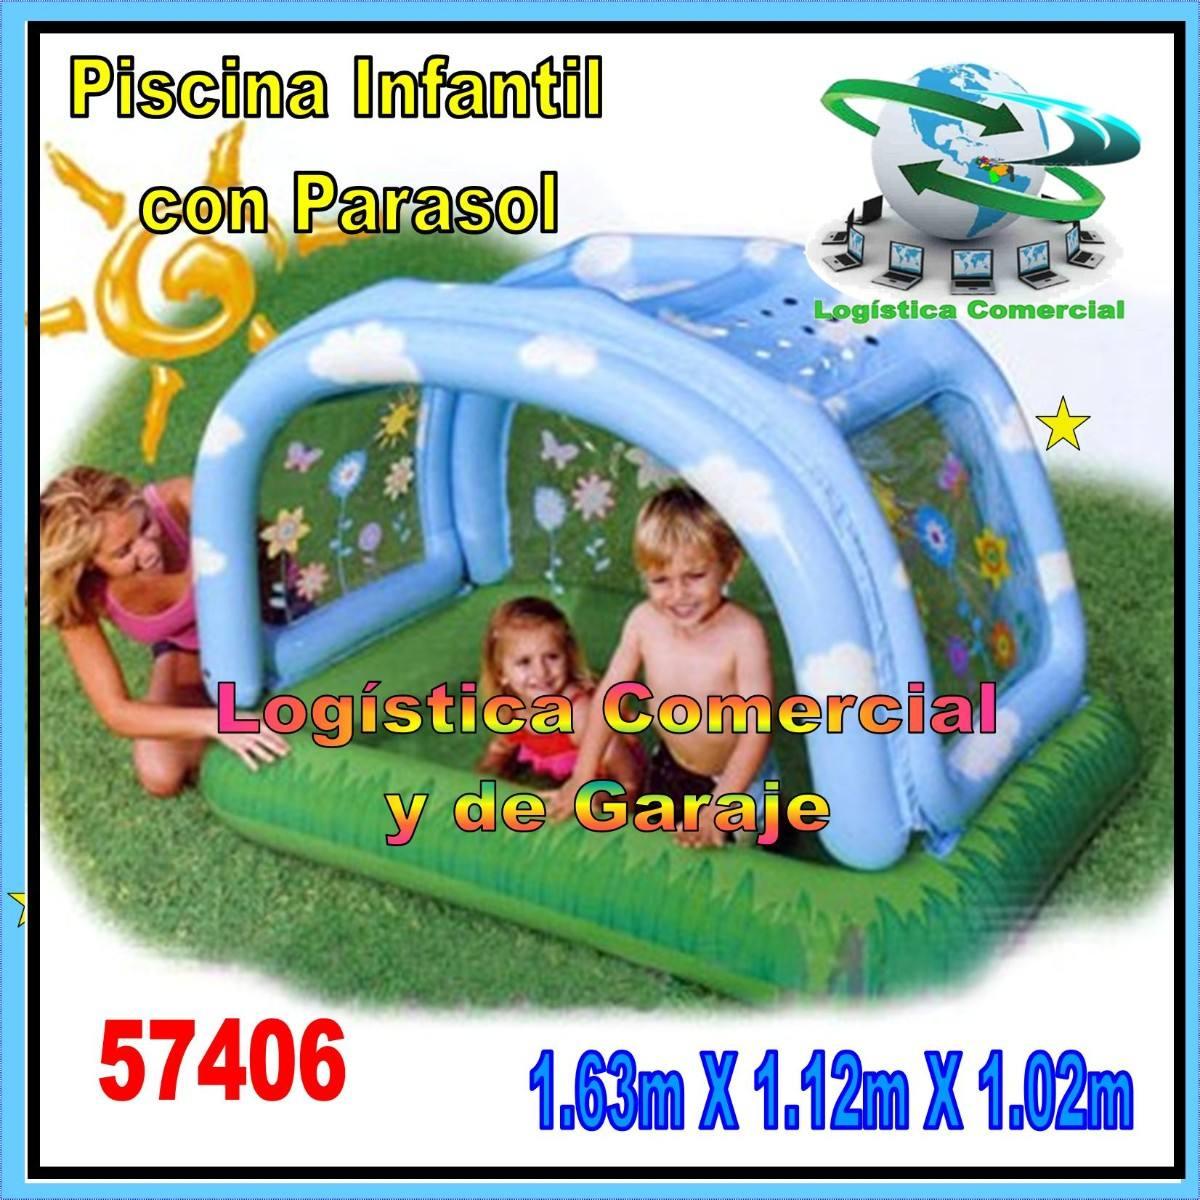 Piscina inflable para ni os intex 57406 con parasol o for Piscina inflable intex